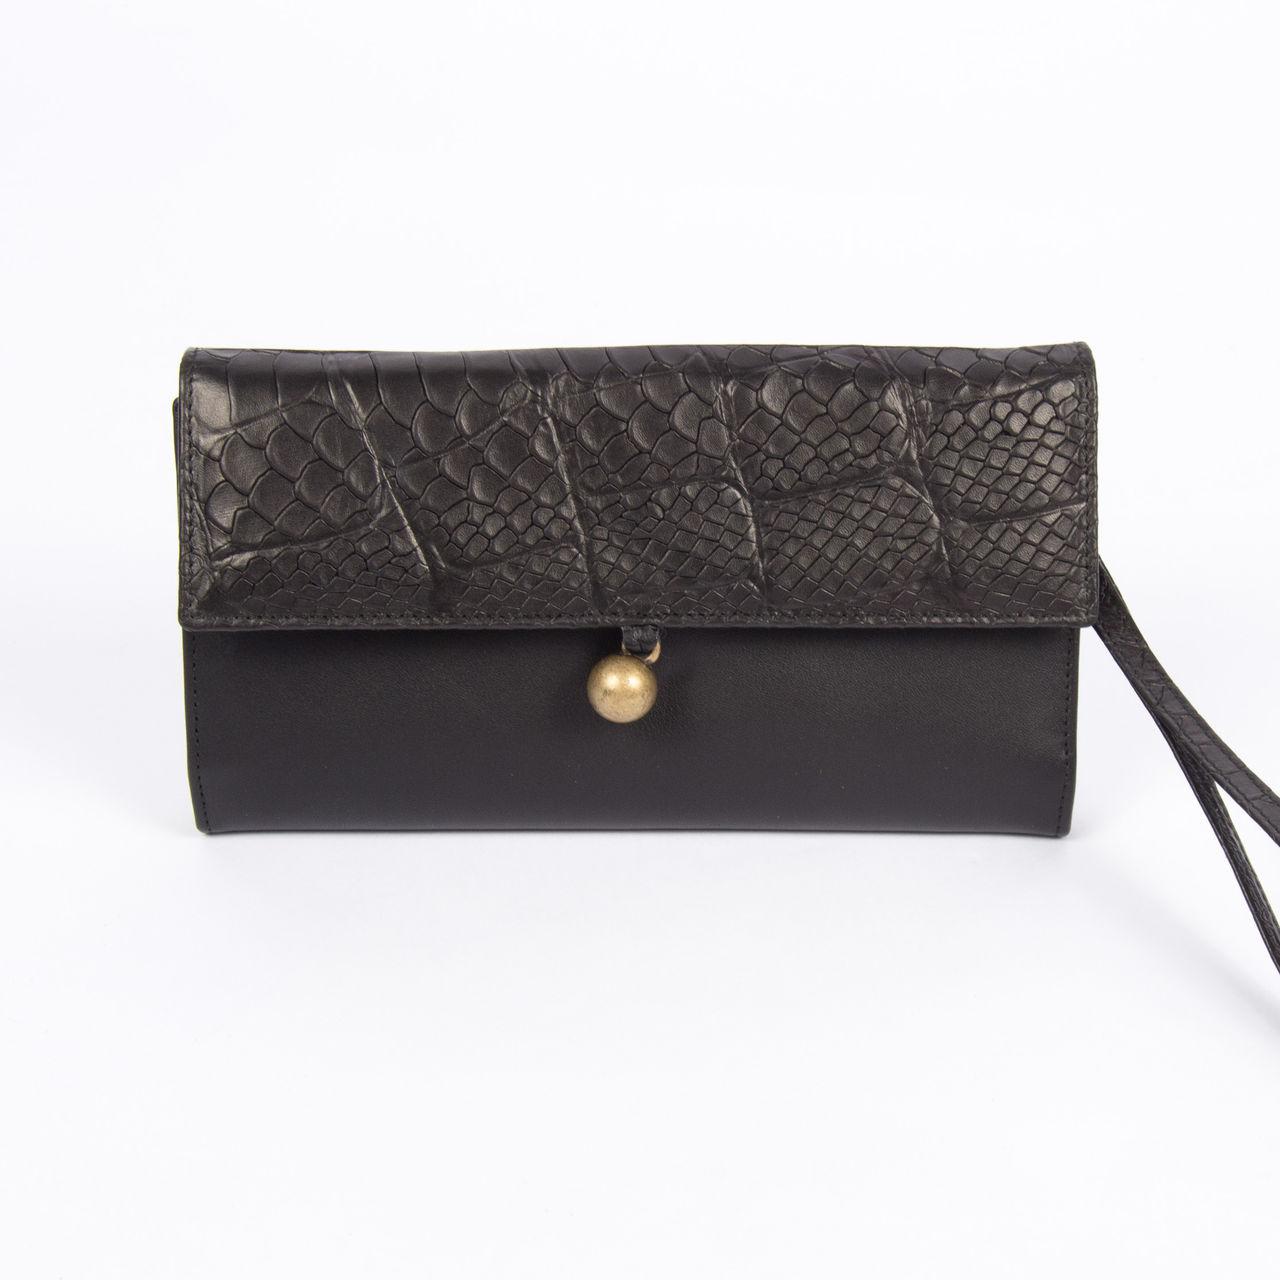 boutique la femme bagagerie petite maroquinerie portefeuille catherine parra. Black Bedroom Furniture Sets. Home Design Ideas